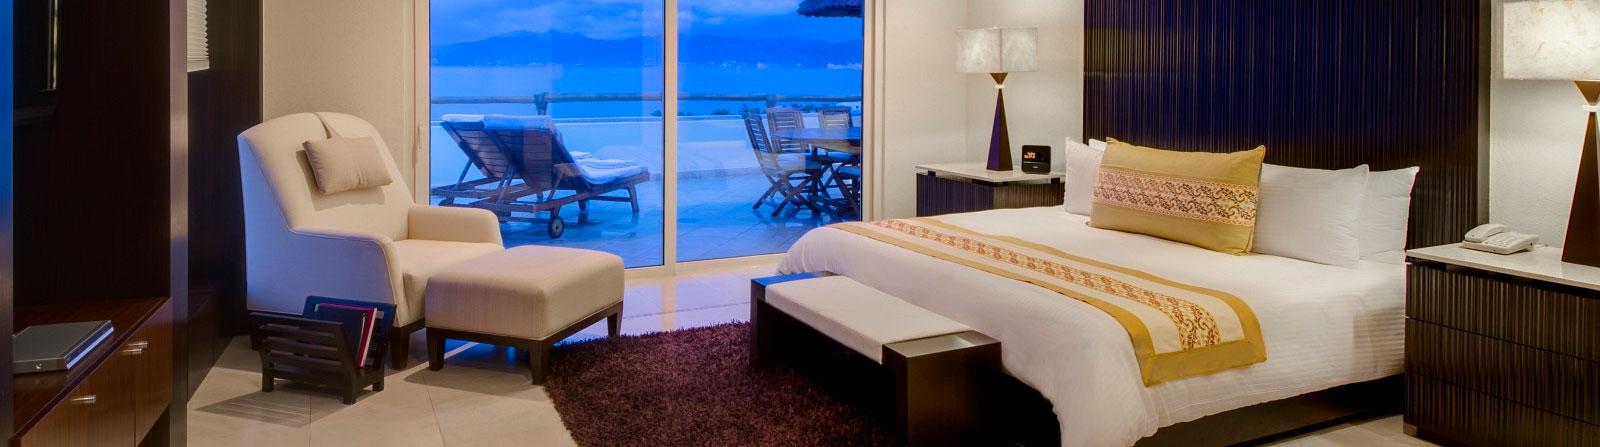 Grand Velas Riviera Nayarit Mexico Suite Presidential